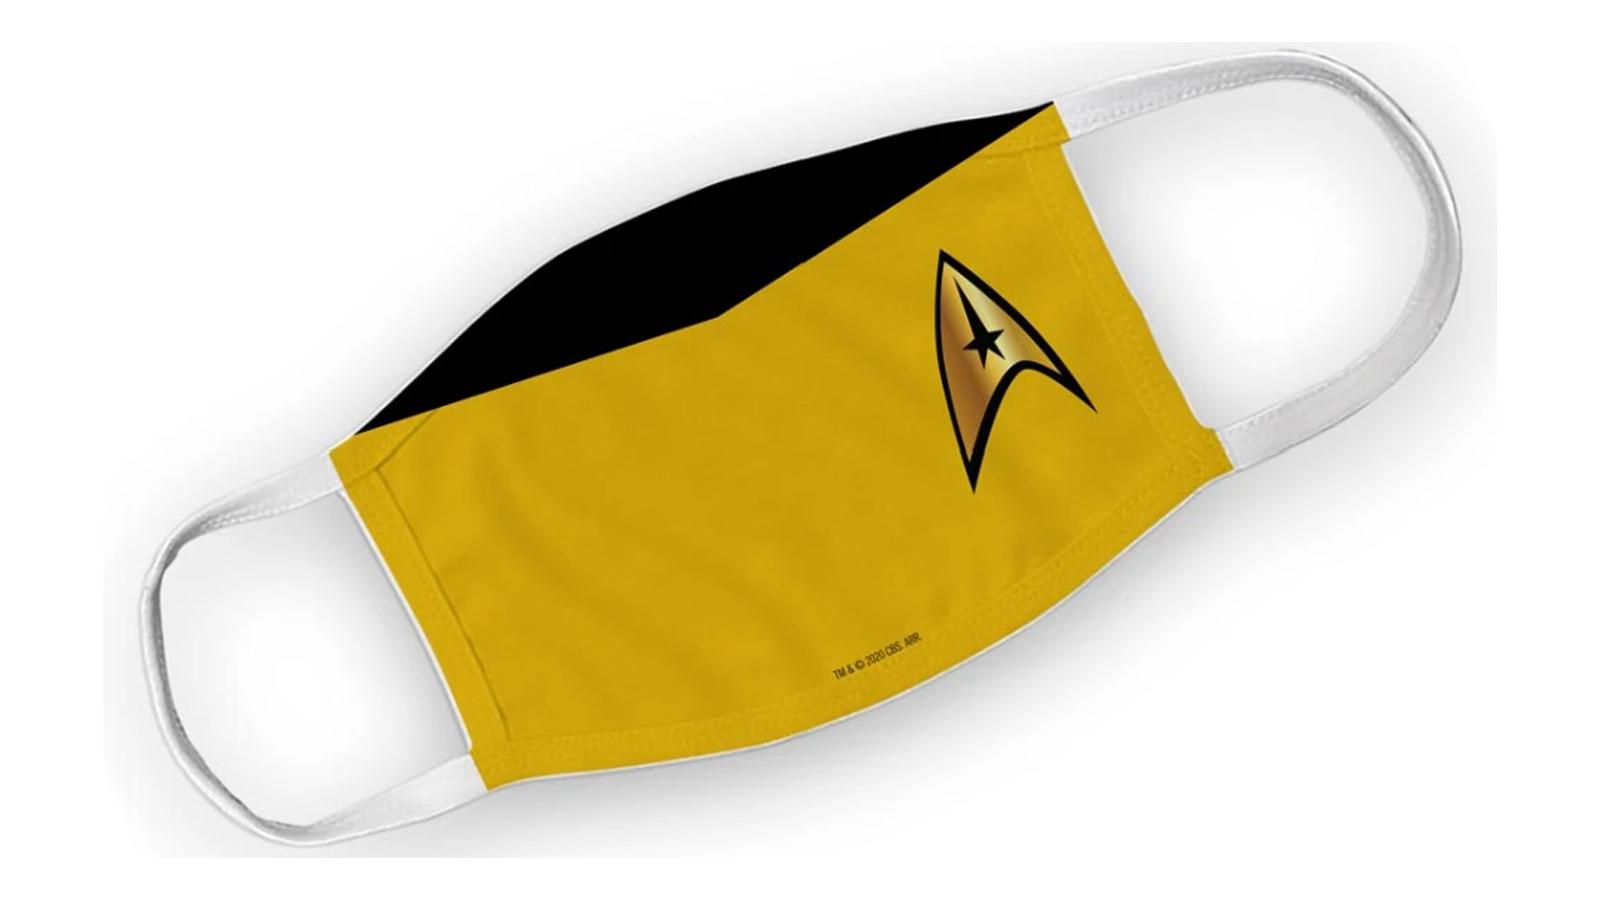 Best Star Trek face mask original series the next generation captain kirk spock picard red shirt